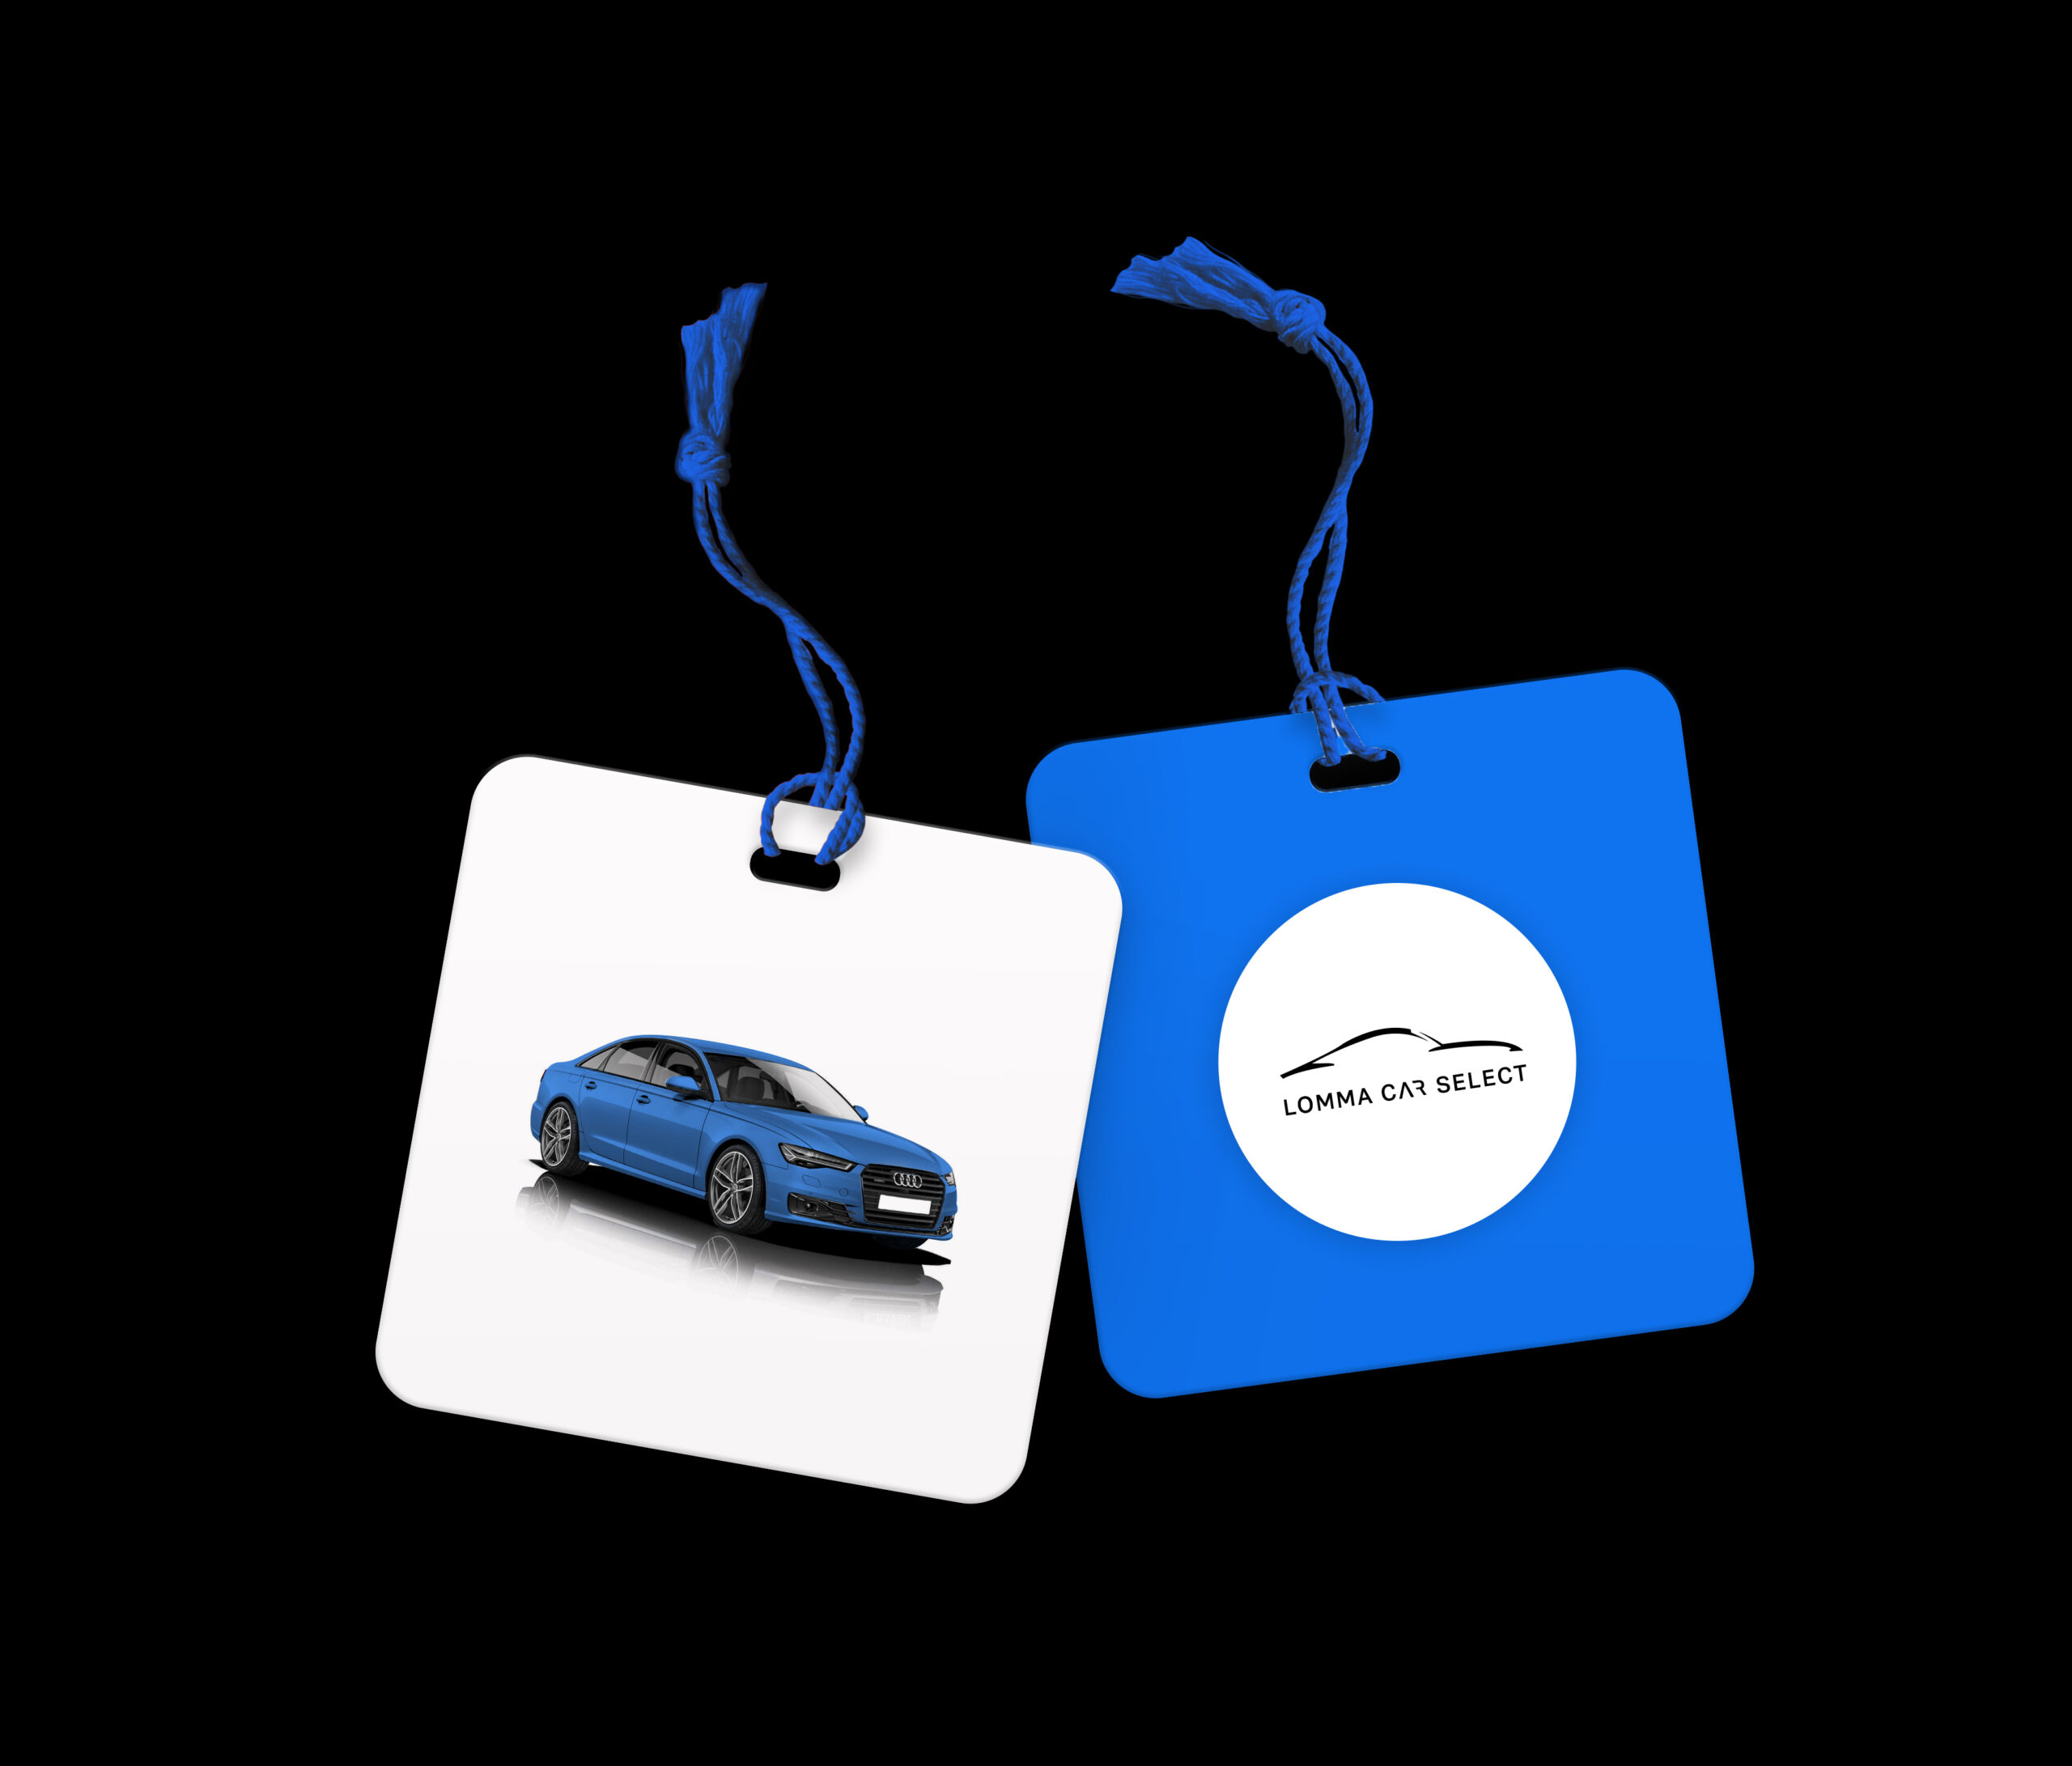 bud-på-bil-lomma-car-select